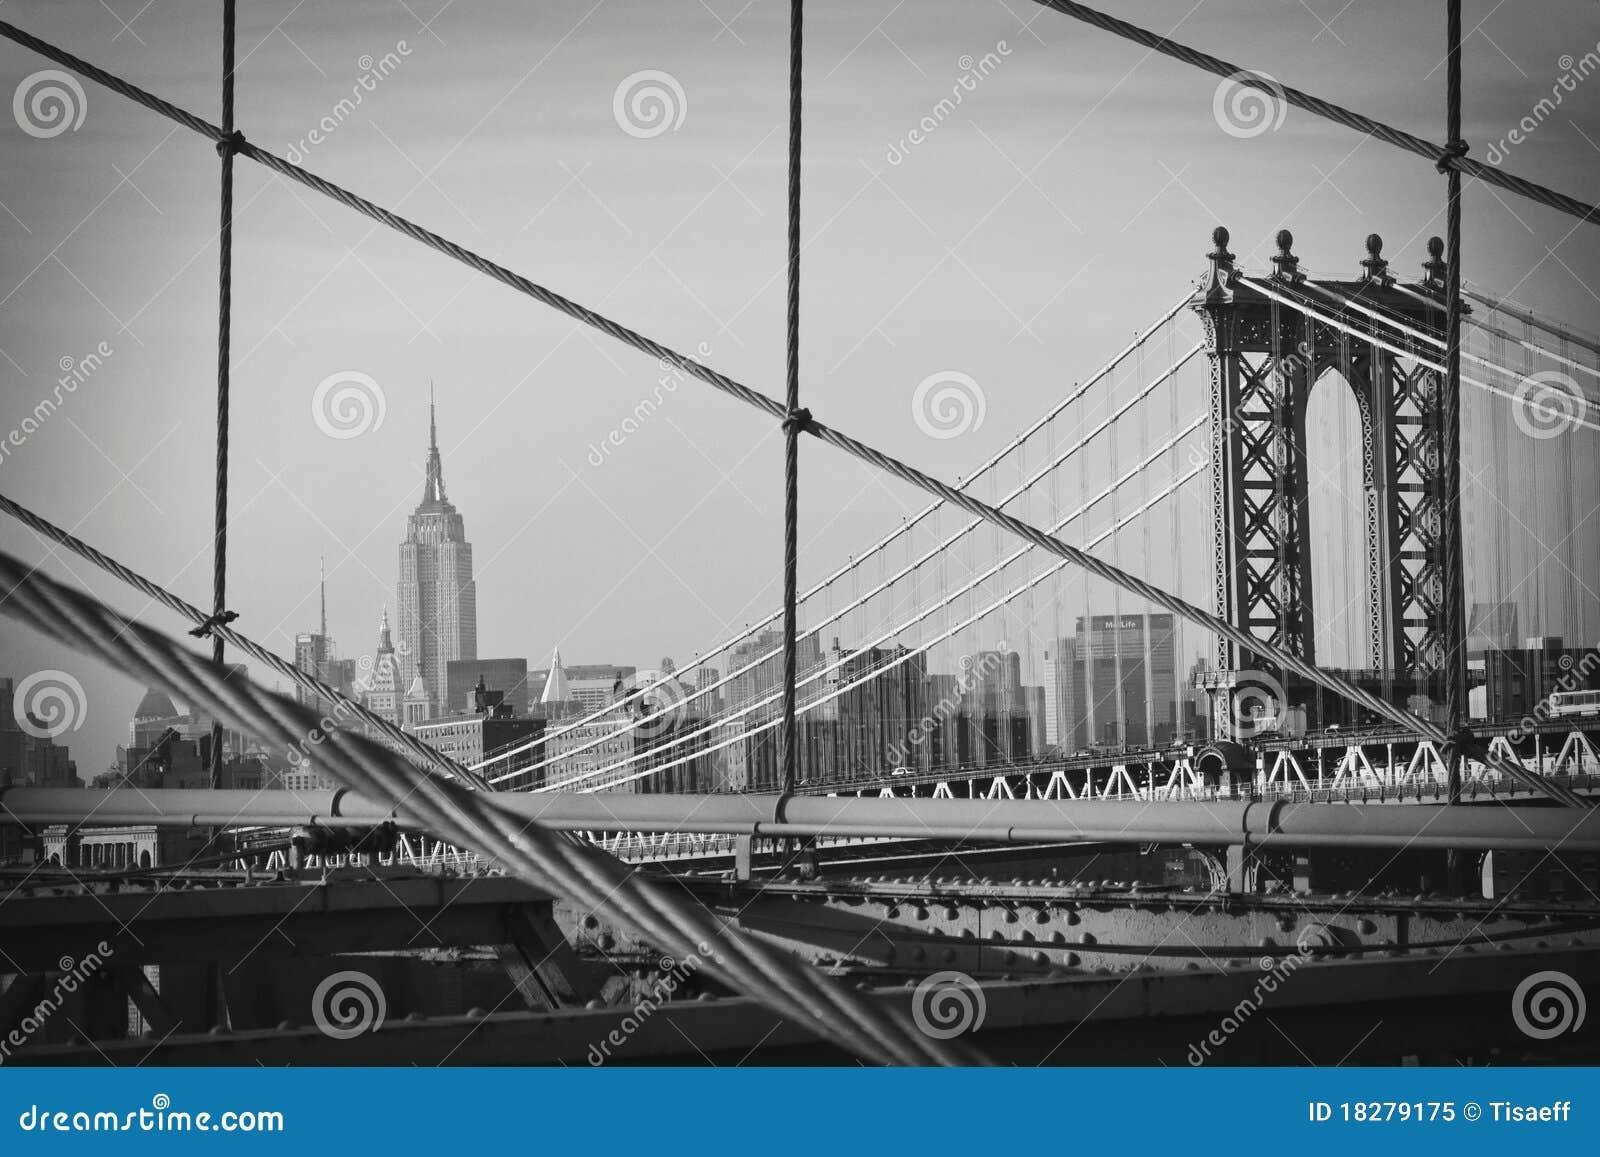 A view of Manhattan from Brooklyn Bridge